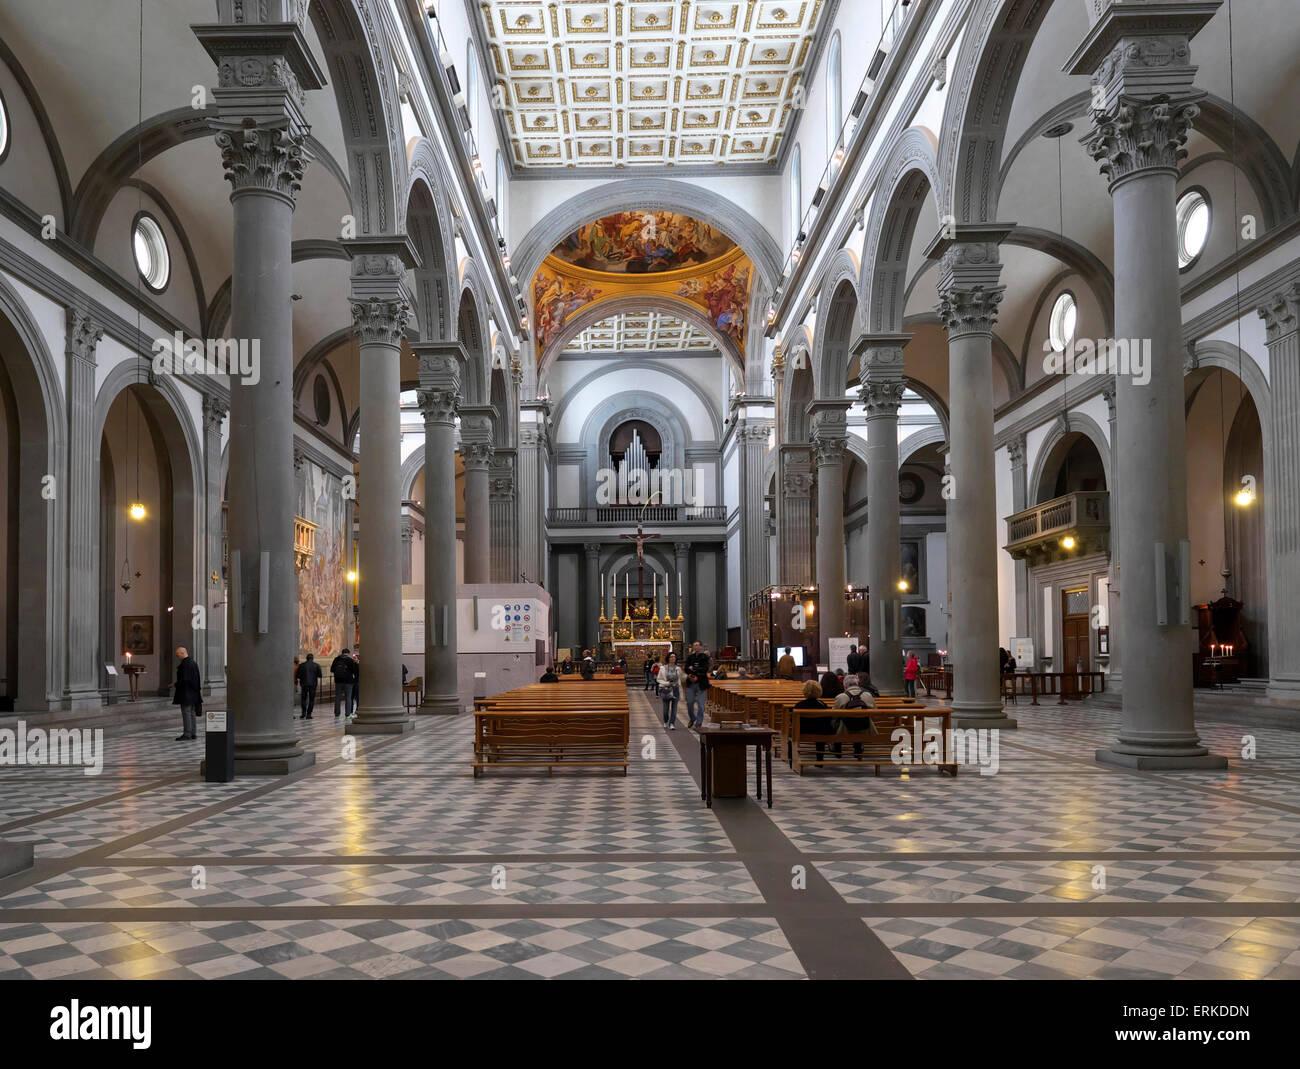 basilica di san lorenzo, florence, tuscany, italy stock photo